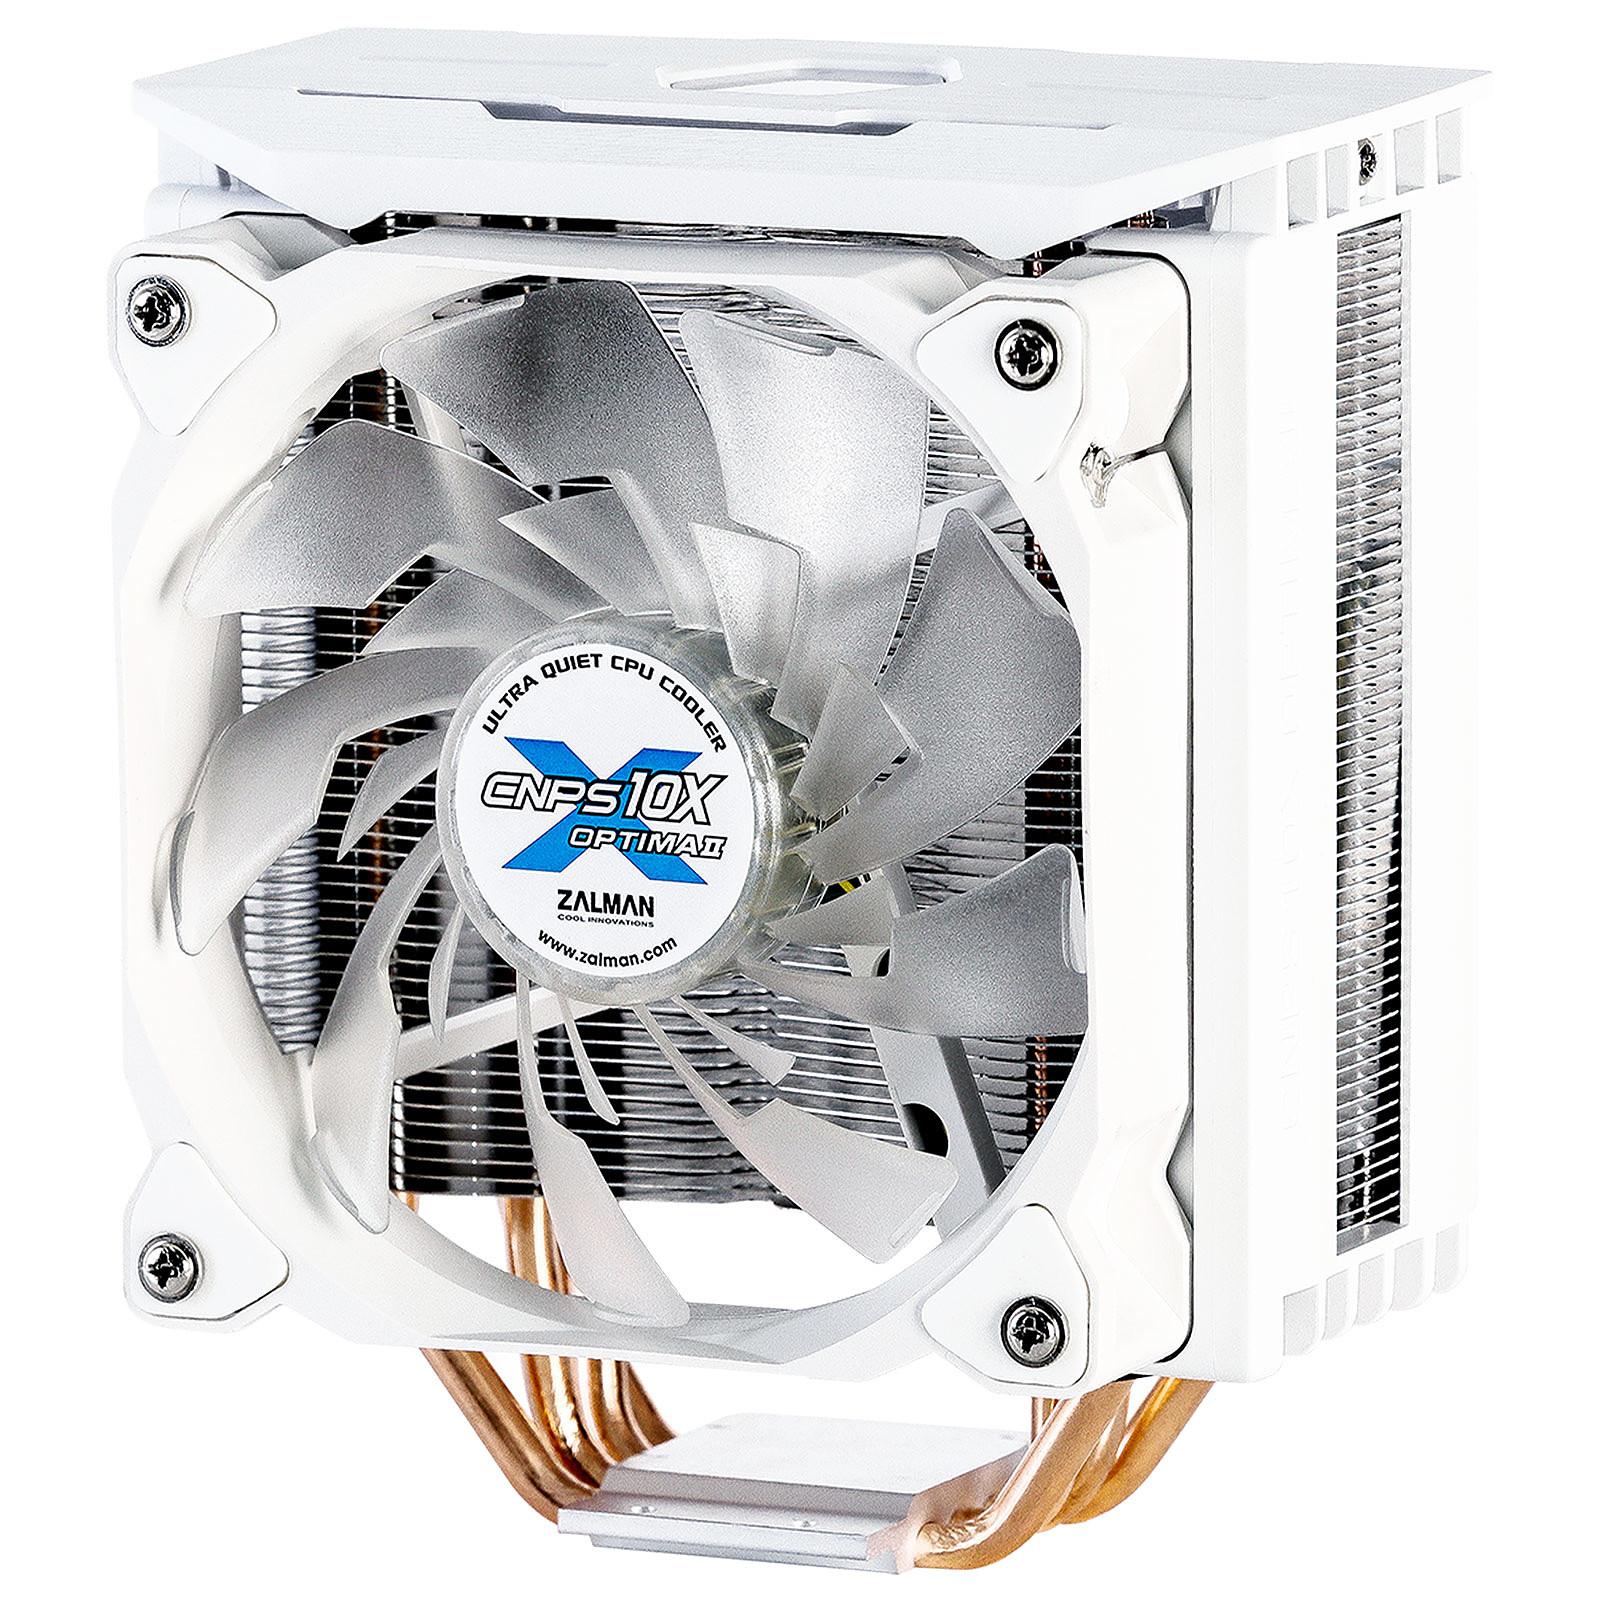 Zalman CNPS10X Optima II (Blanc)